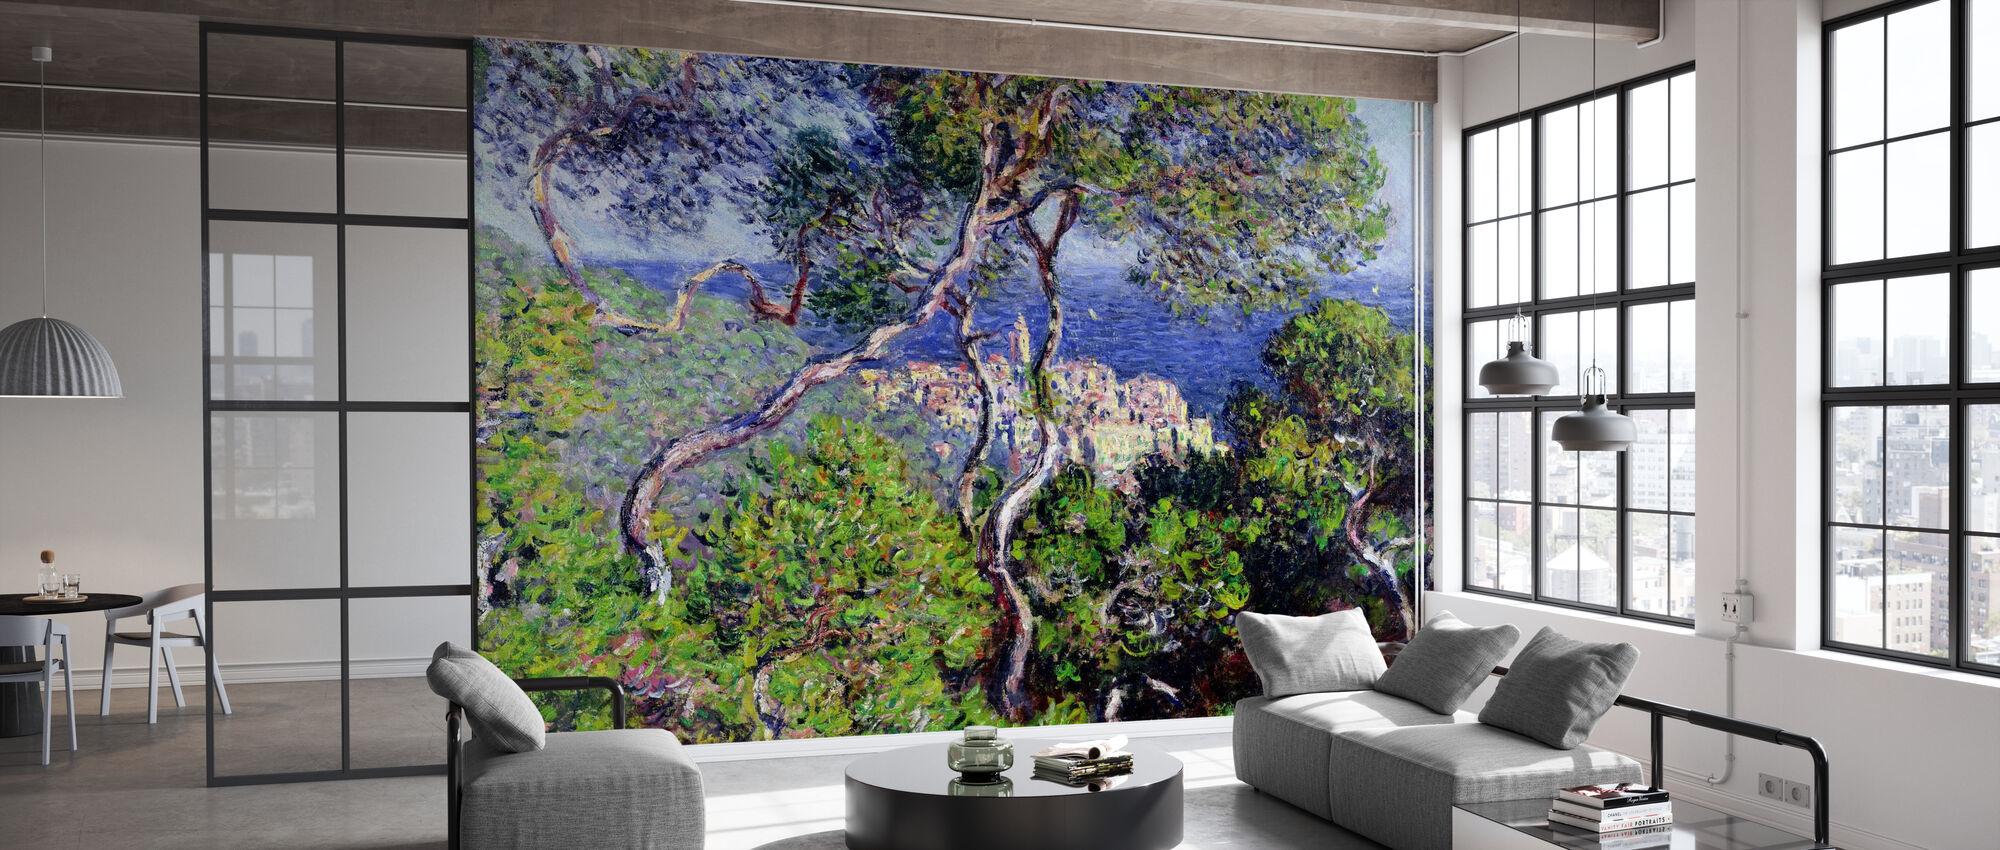 Bordighera -  Claude Monet - Tapete - Büro